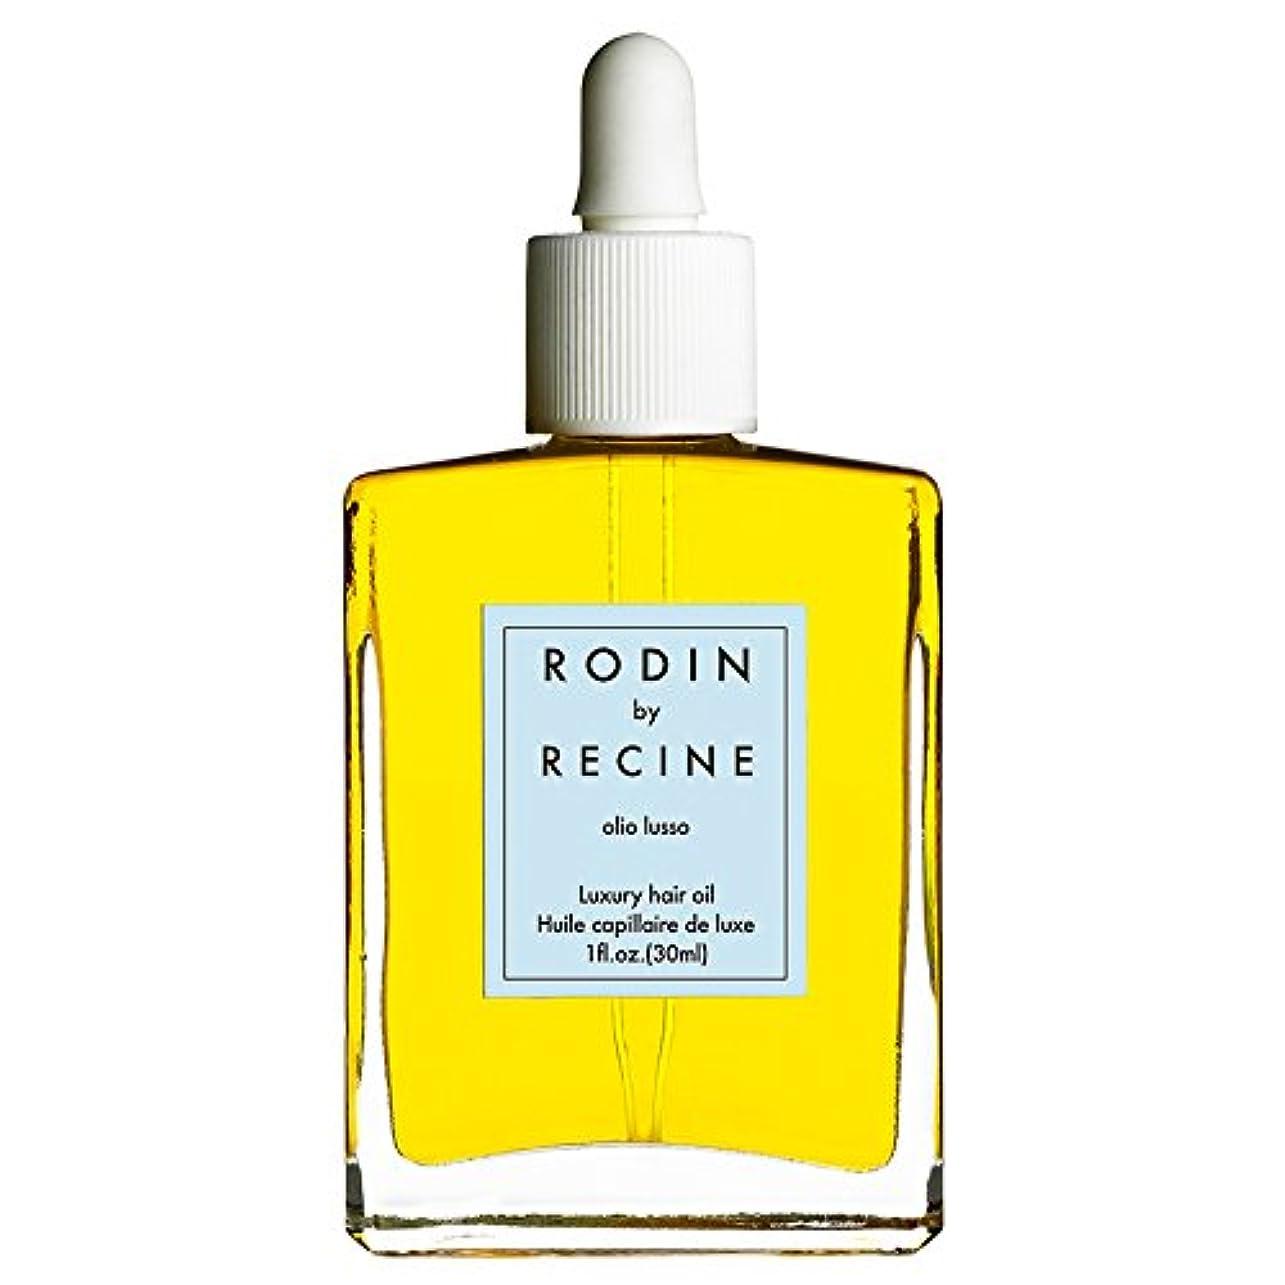 不規則性離婚魅惑するRodin By Recine Luxury Hair Oil 1oz (30ml) by Rodin